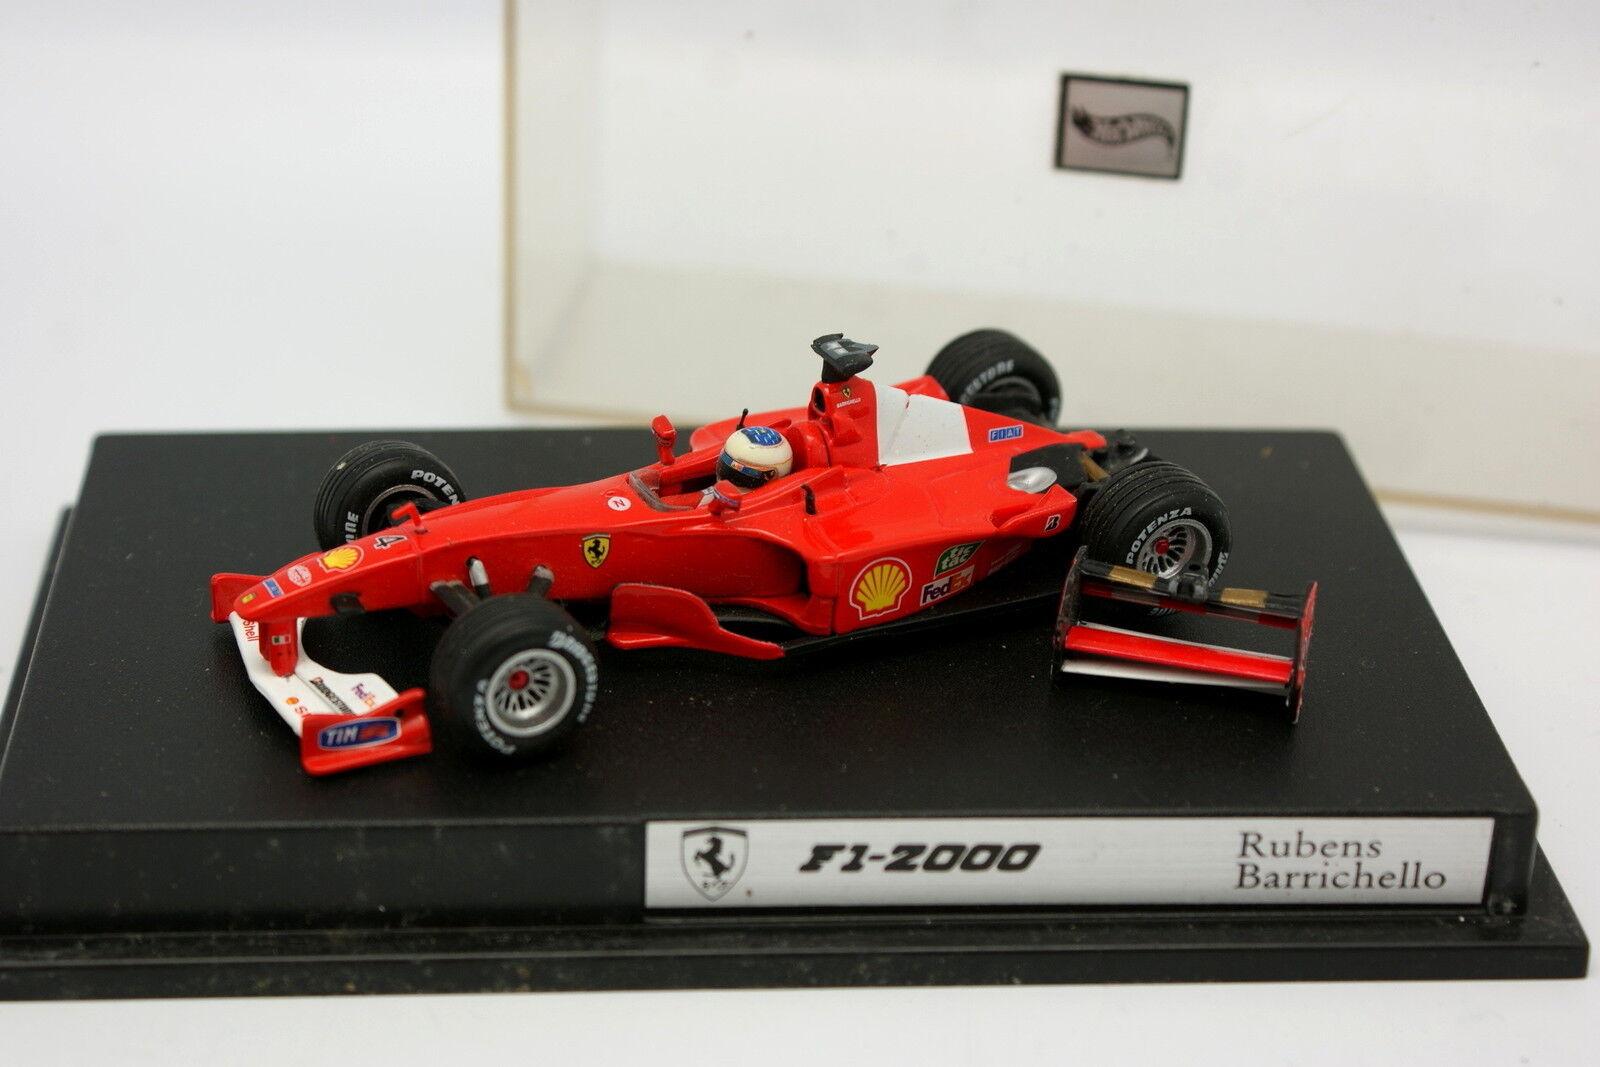 Hot Wheels 1 43 - F1 F1 F1 Ferrari F1 2000 Barrichello 1ec6c4